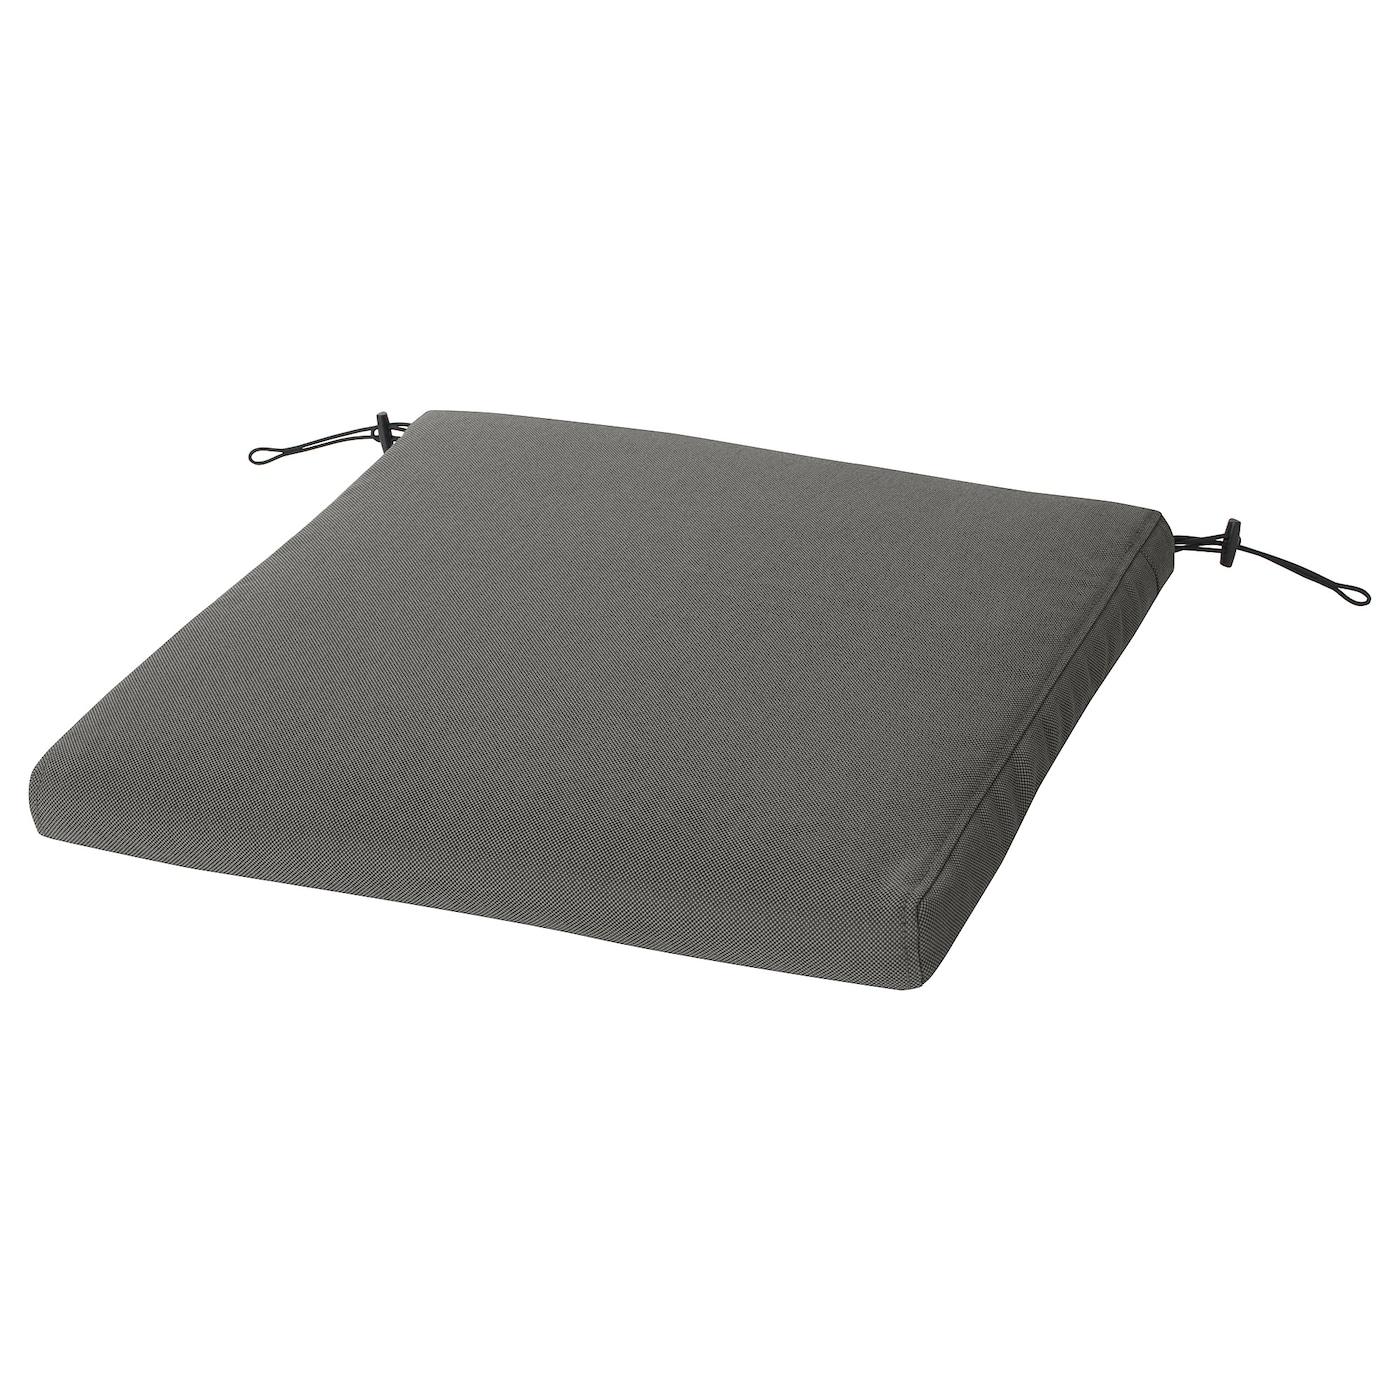 Bondholmen Table 6 Armchairs Outdoor Gray Stained Froson Duvholmen Dark Gray Ikea